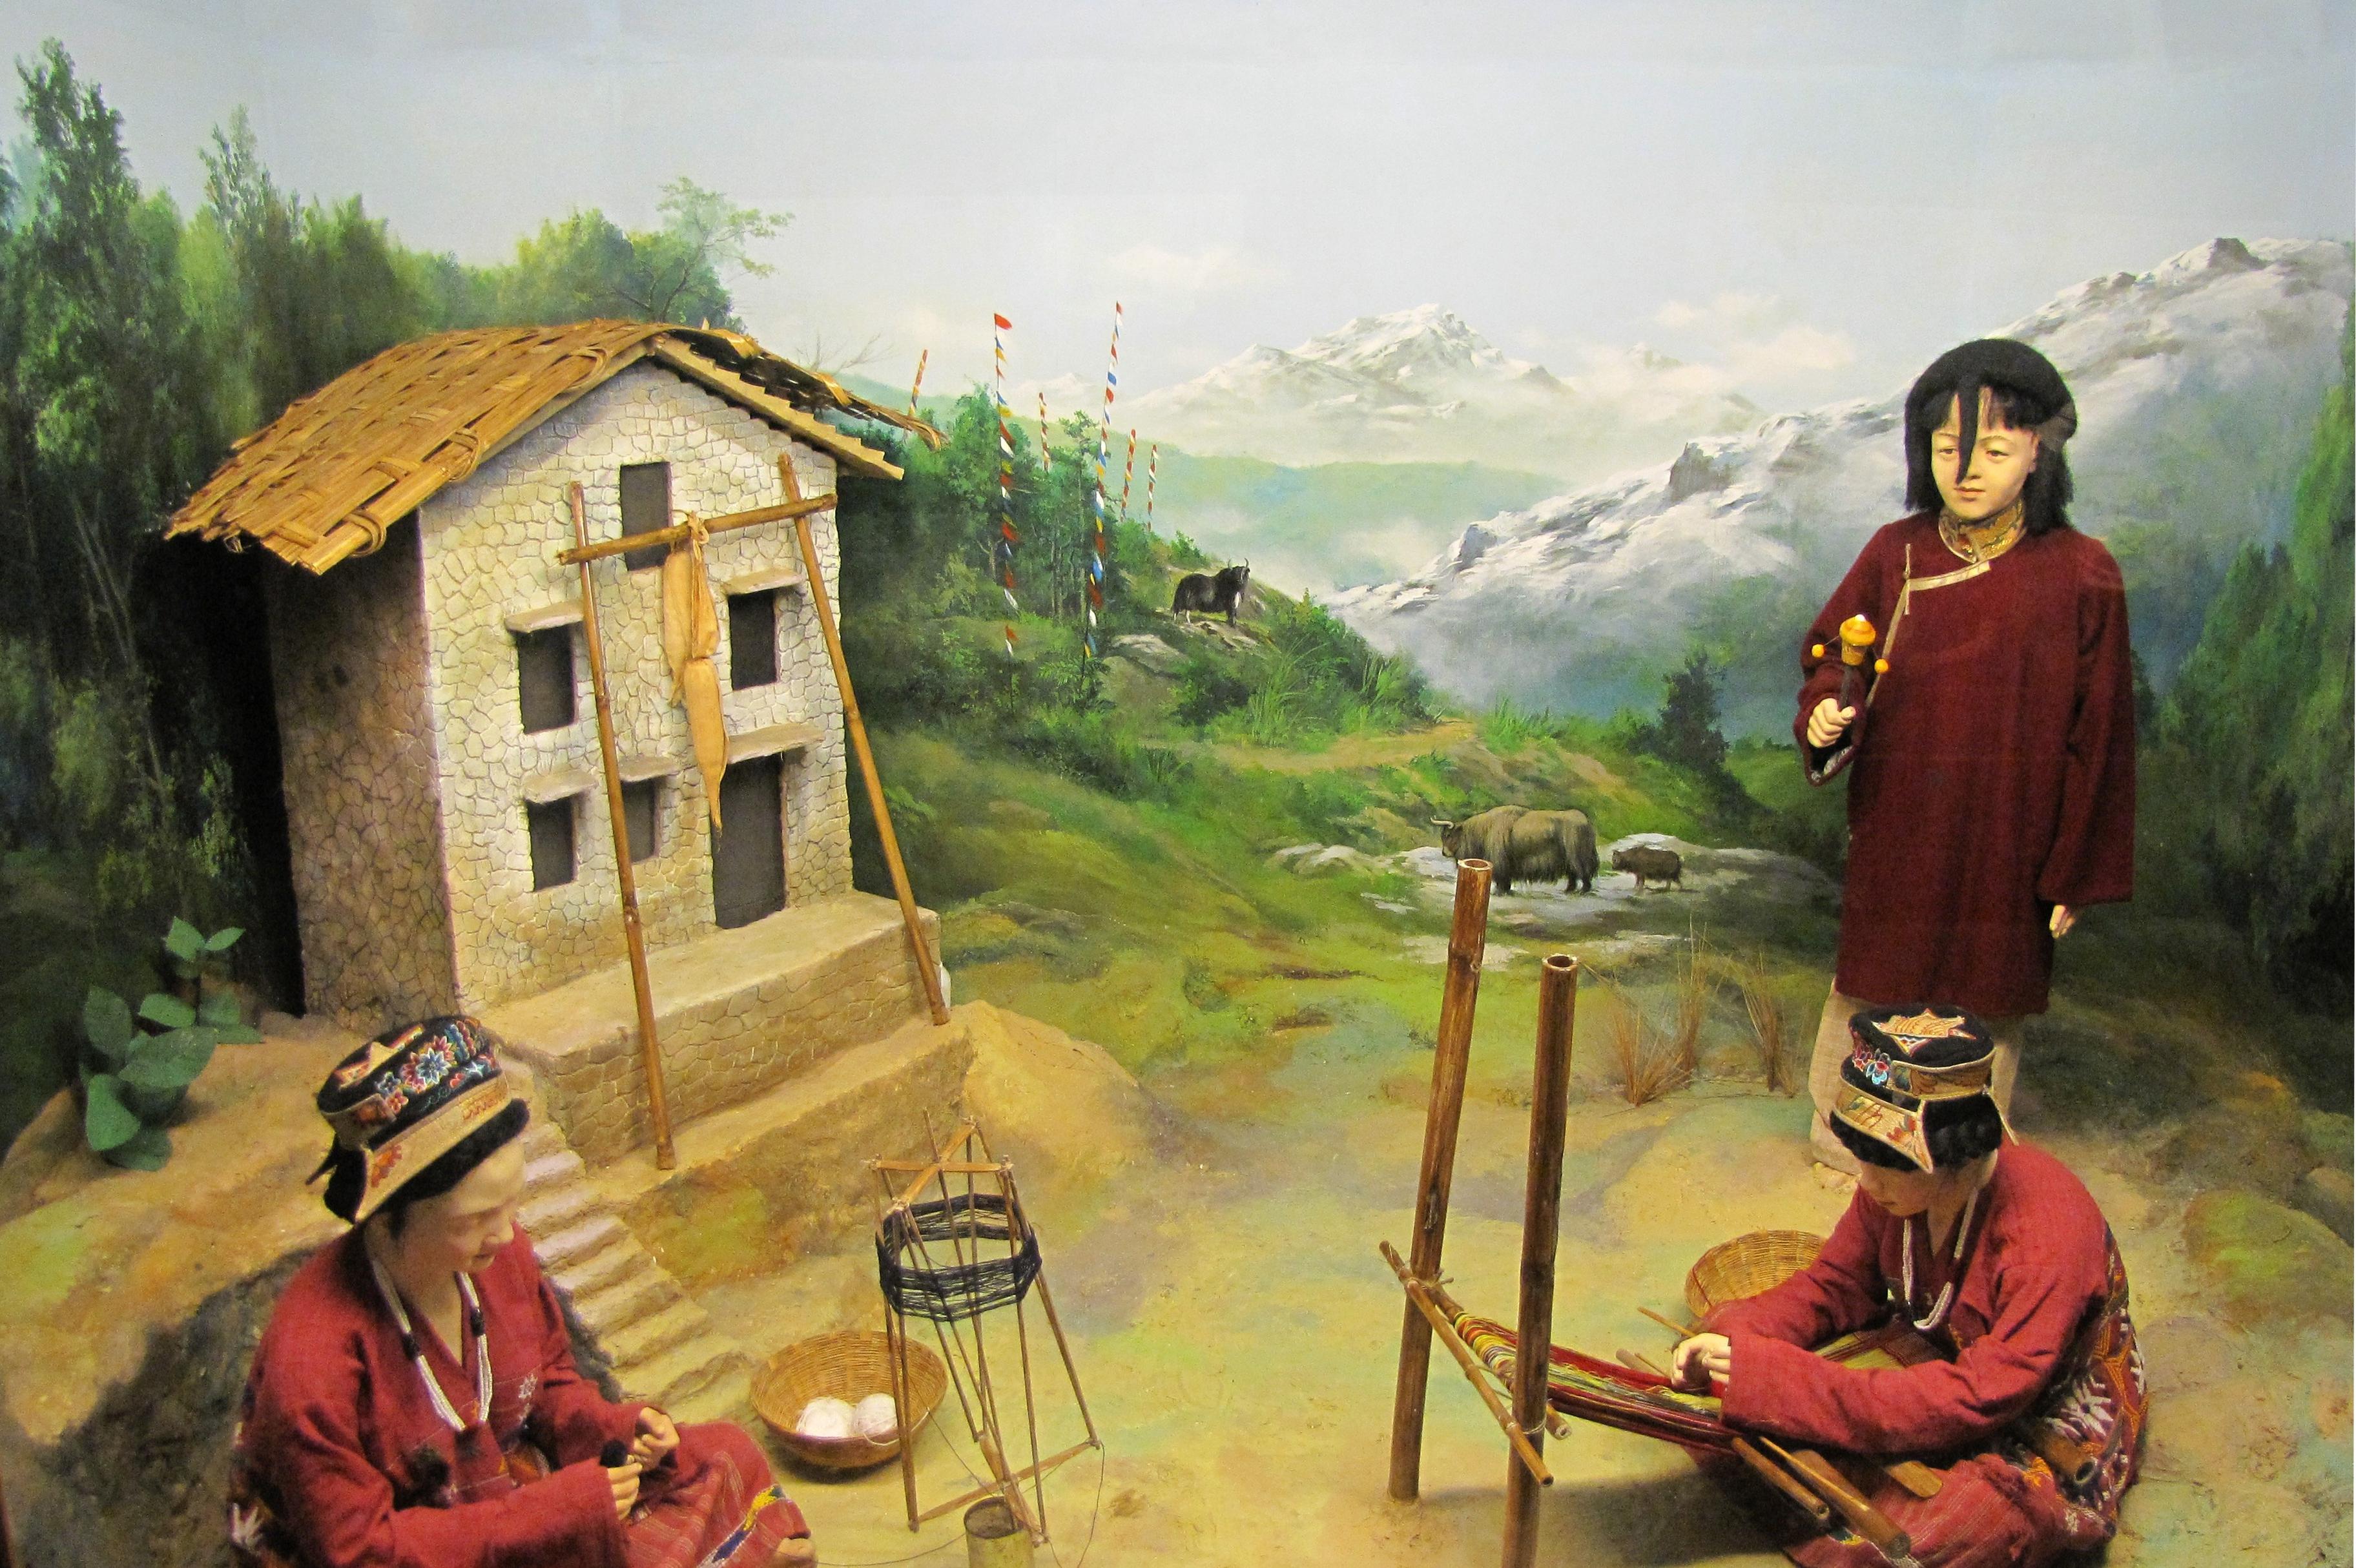 Diorama - Wikipedia